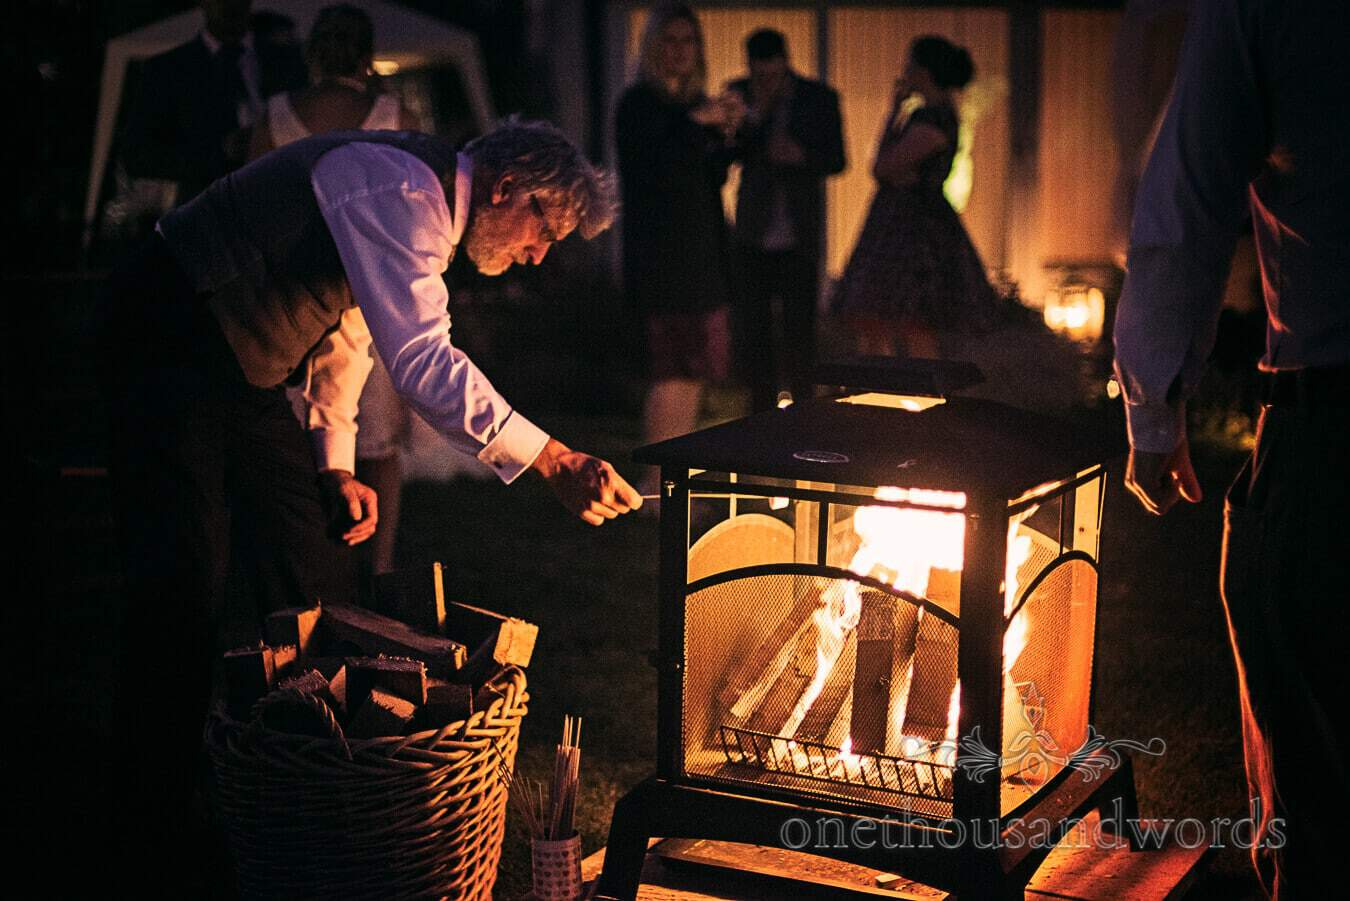 Wood fire is lit at Dorset Home Wedding evening reception